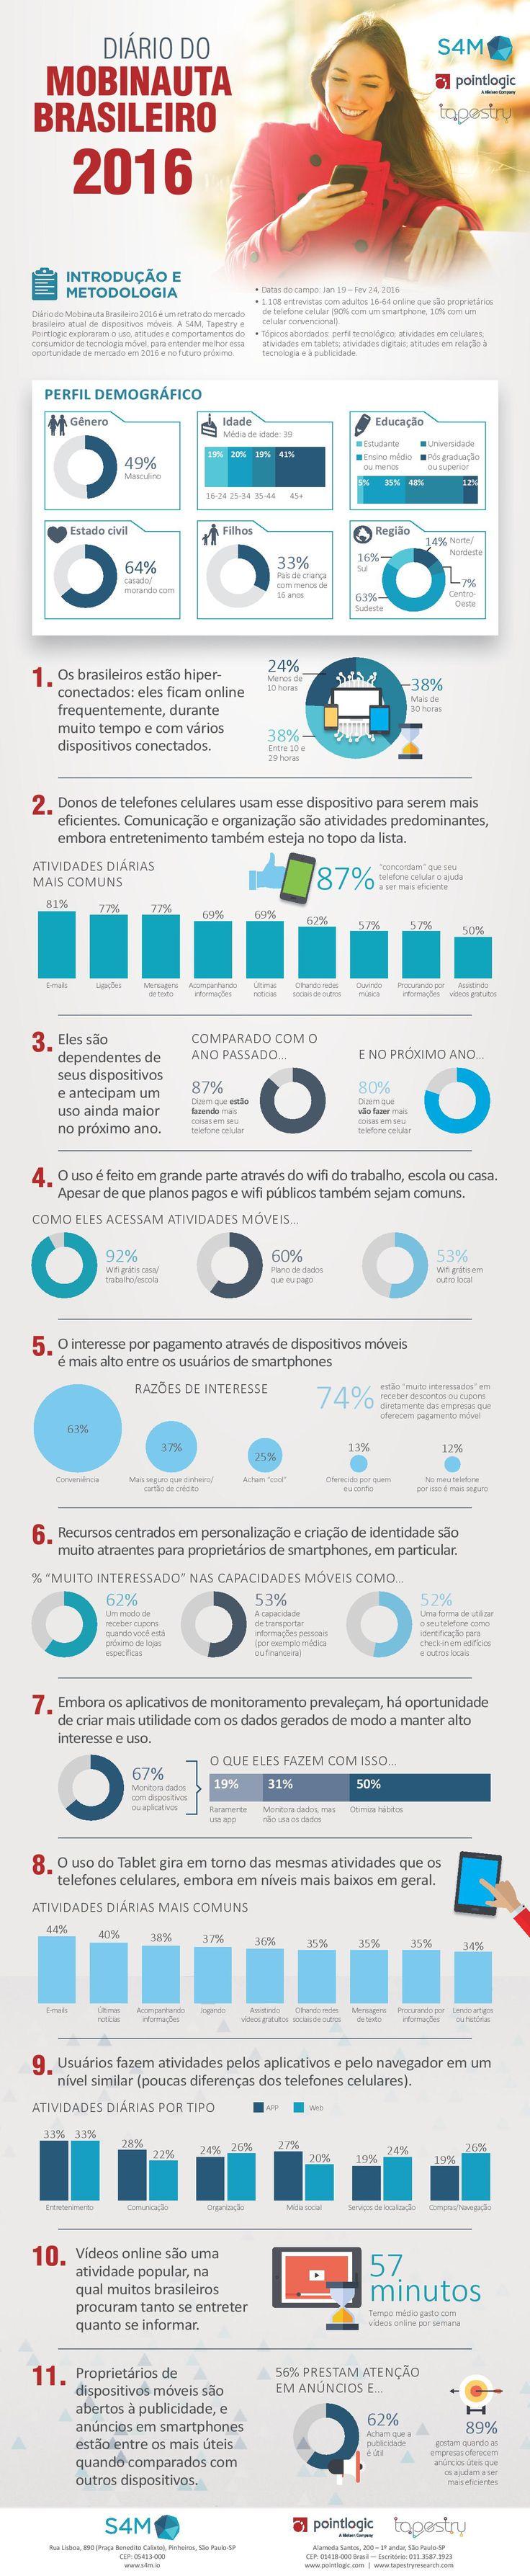 Infográfico mapeia uso de mobile no Brasil - ADNEWS